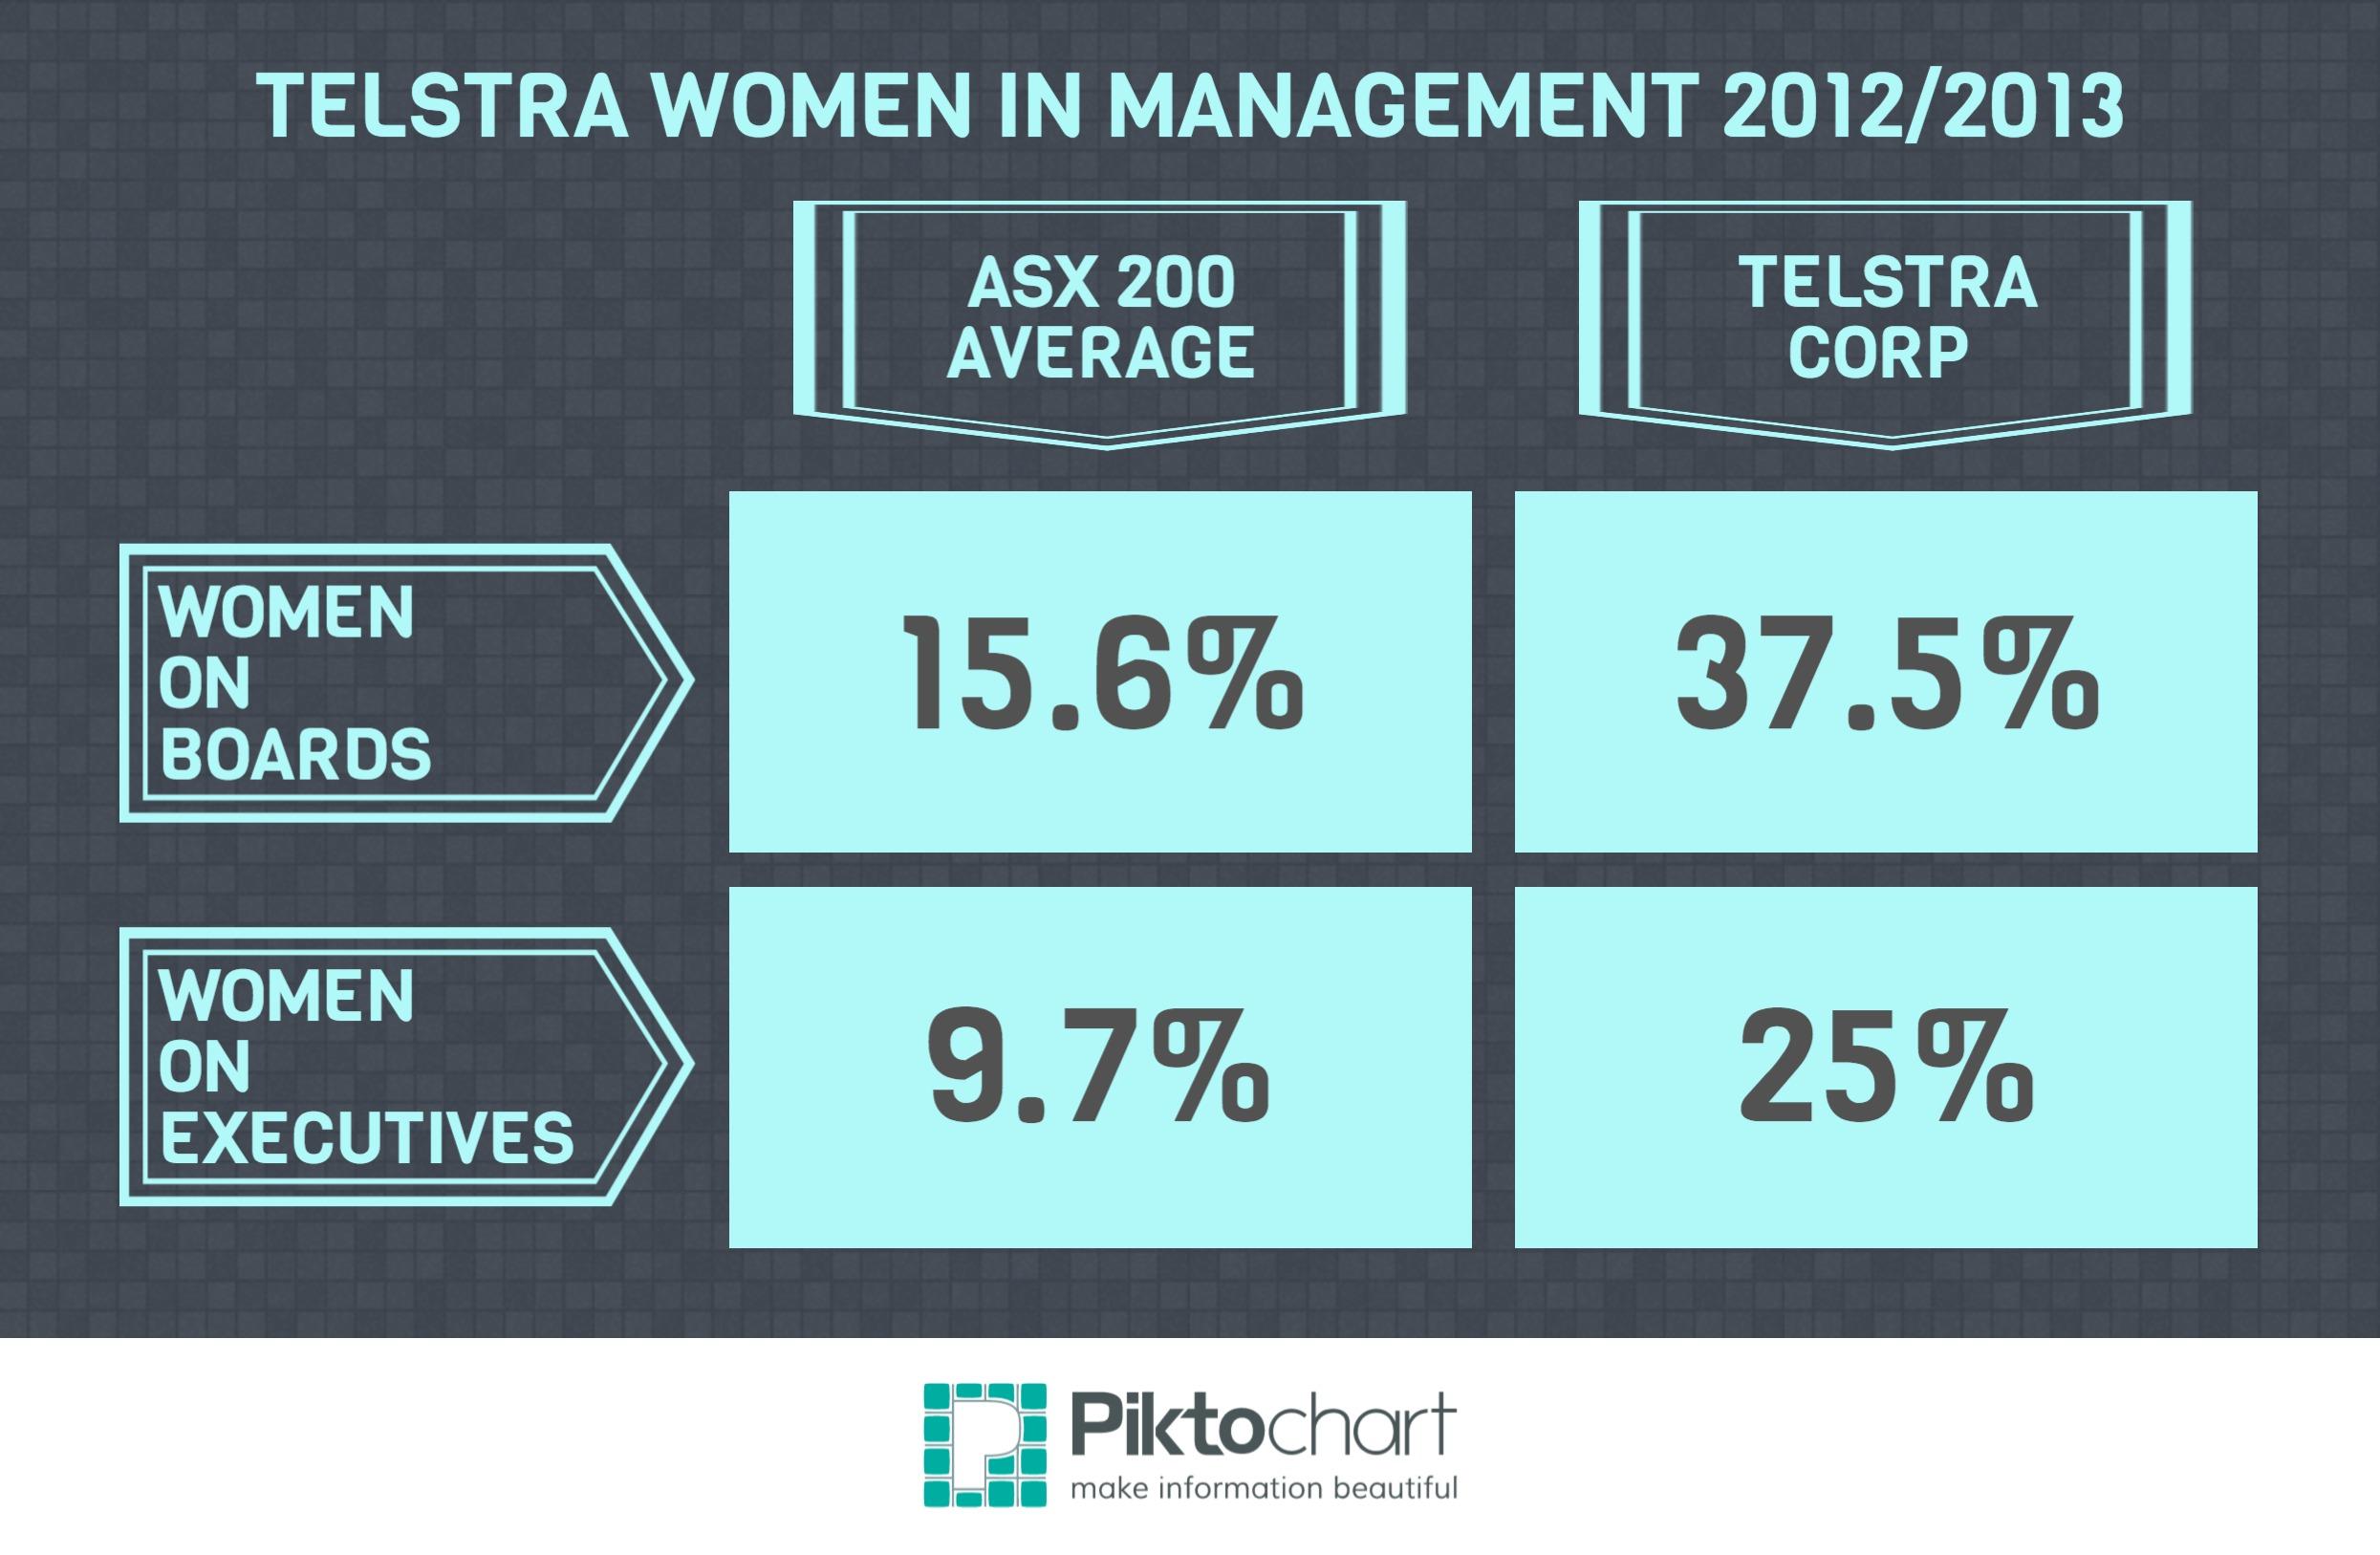 Telstra Executive Women 2012/13